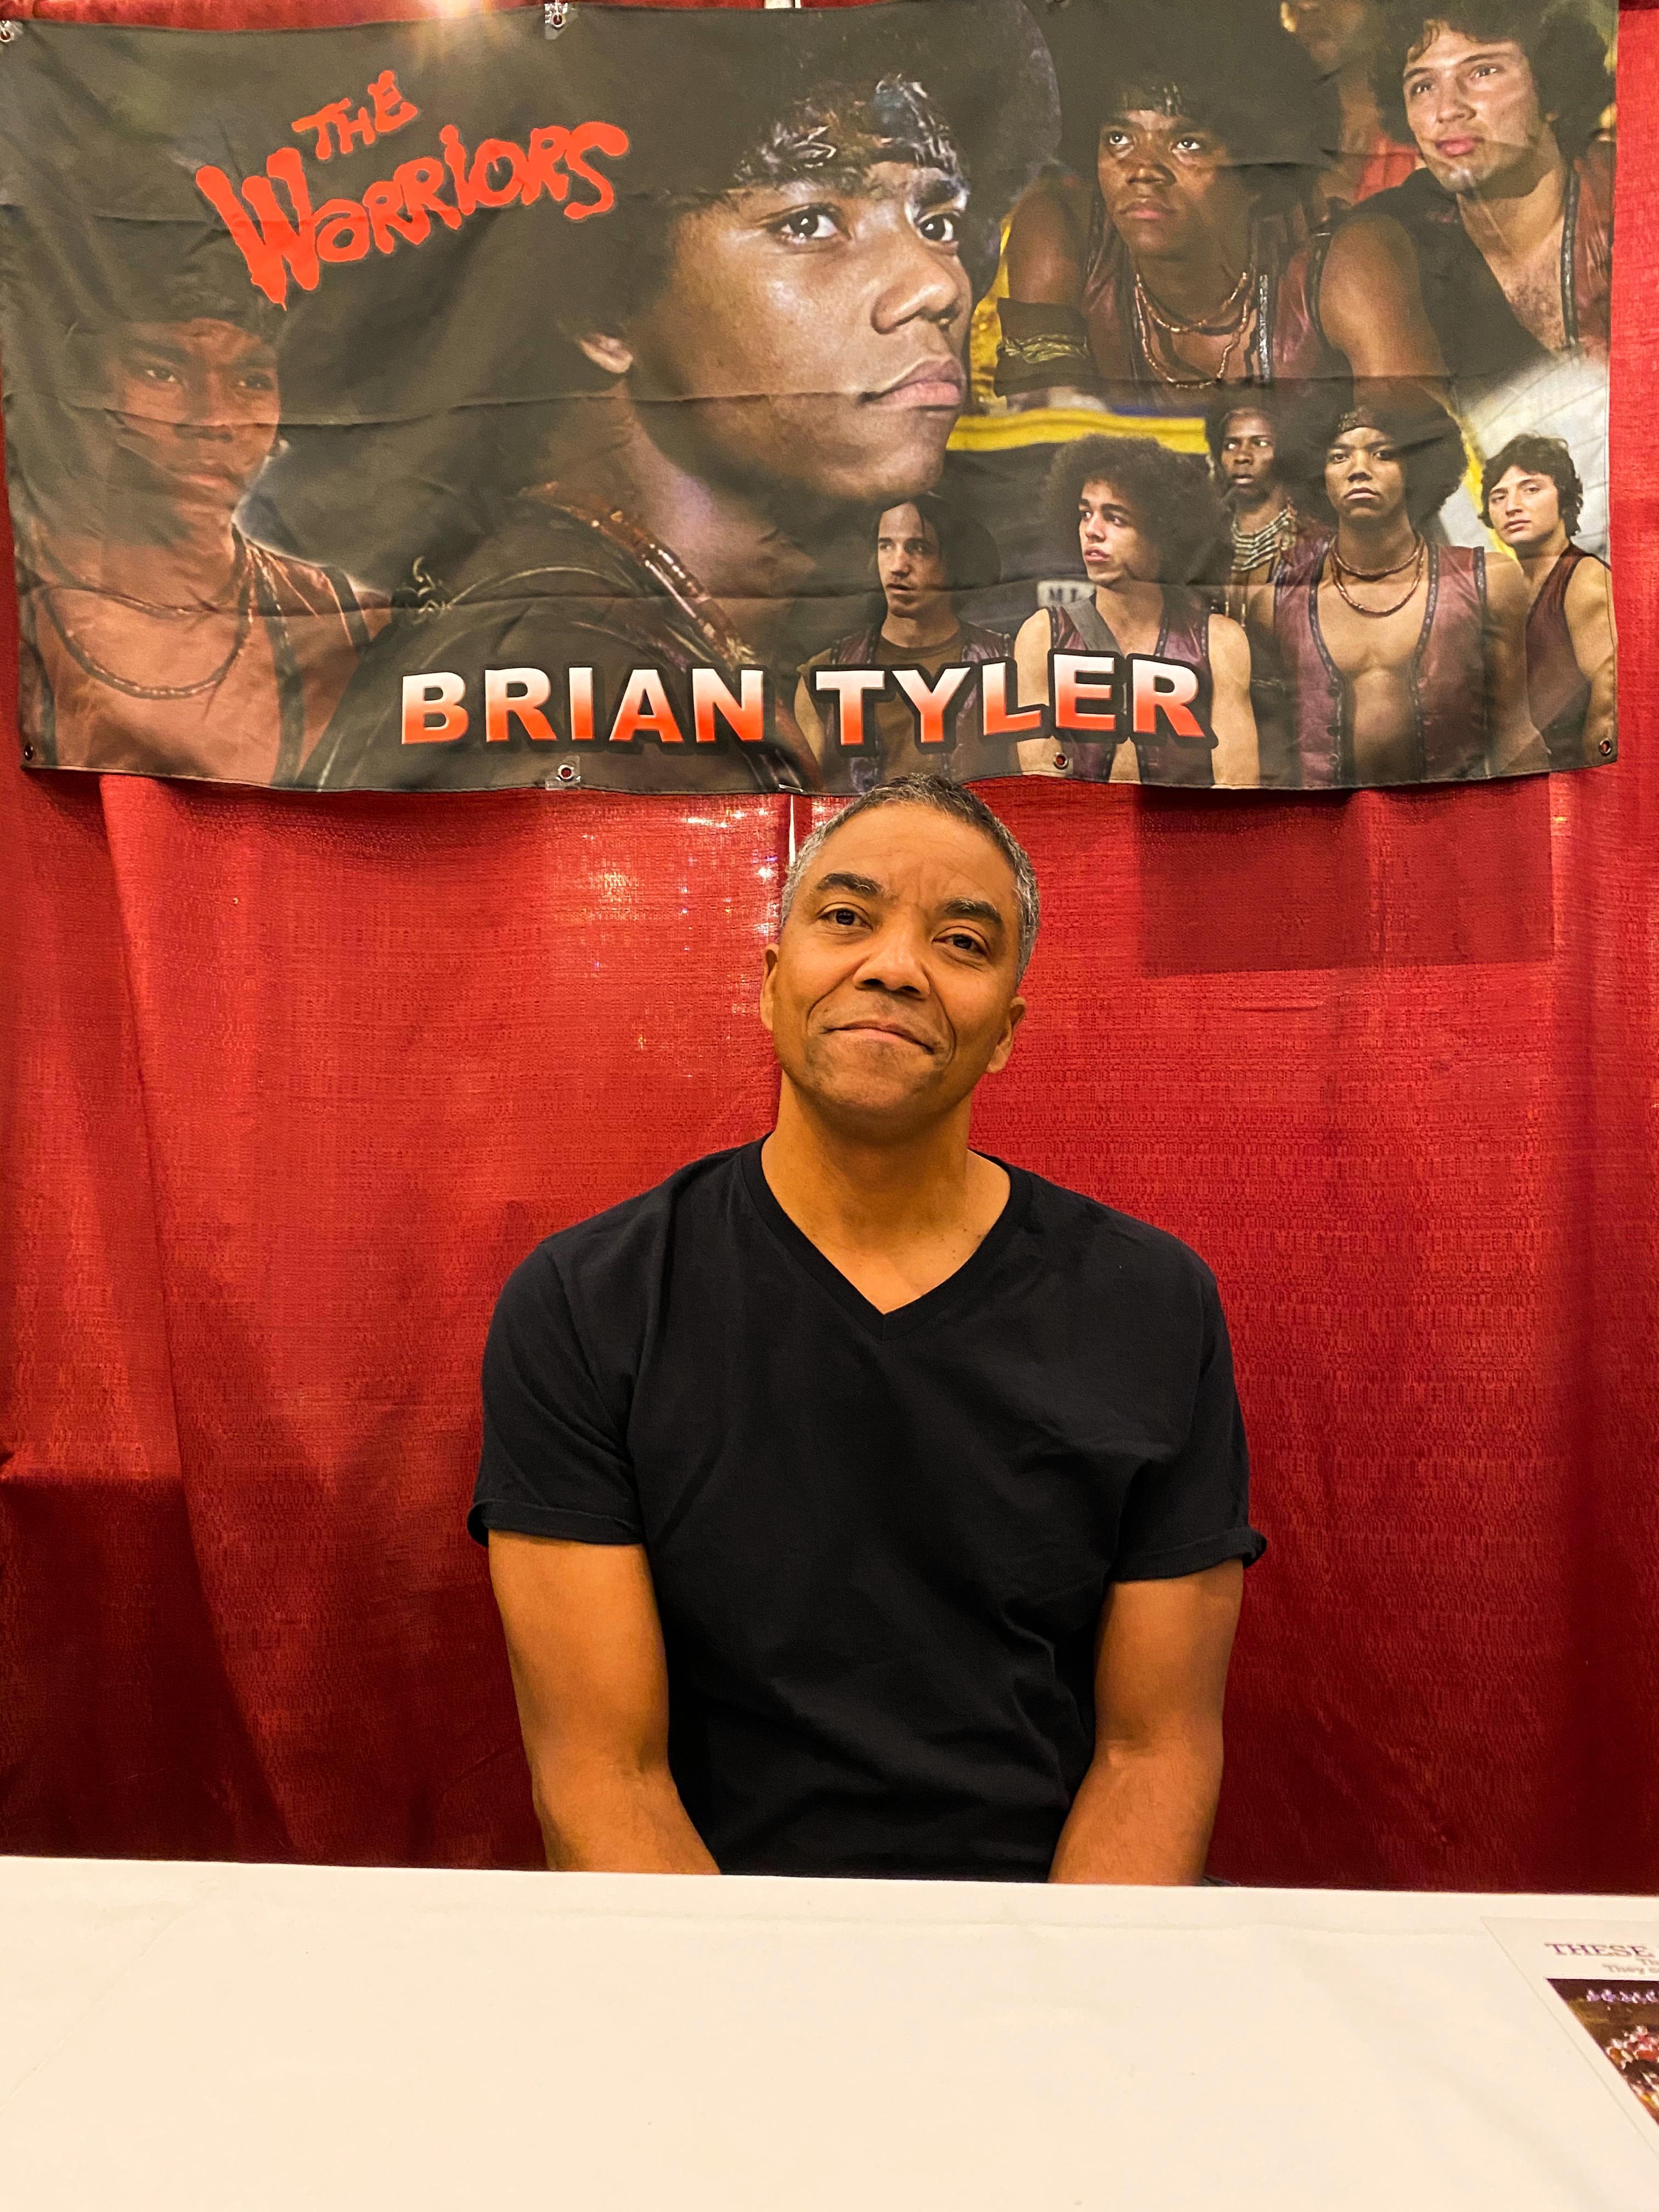 Brian Tyler (The Warriors).